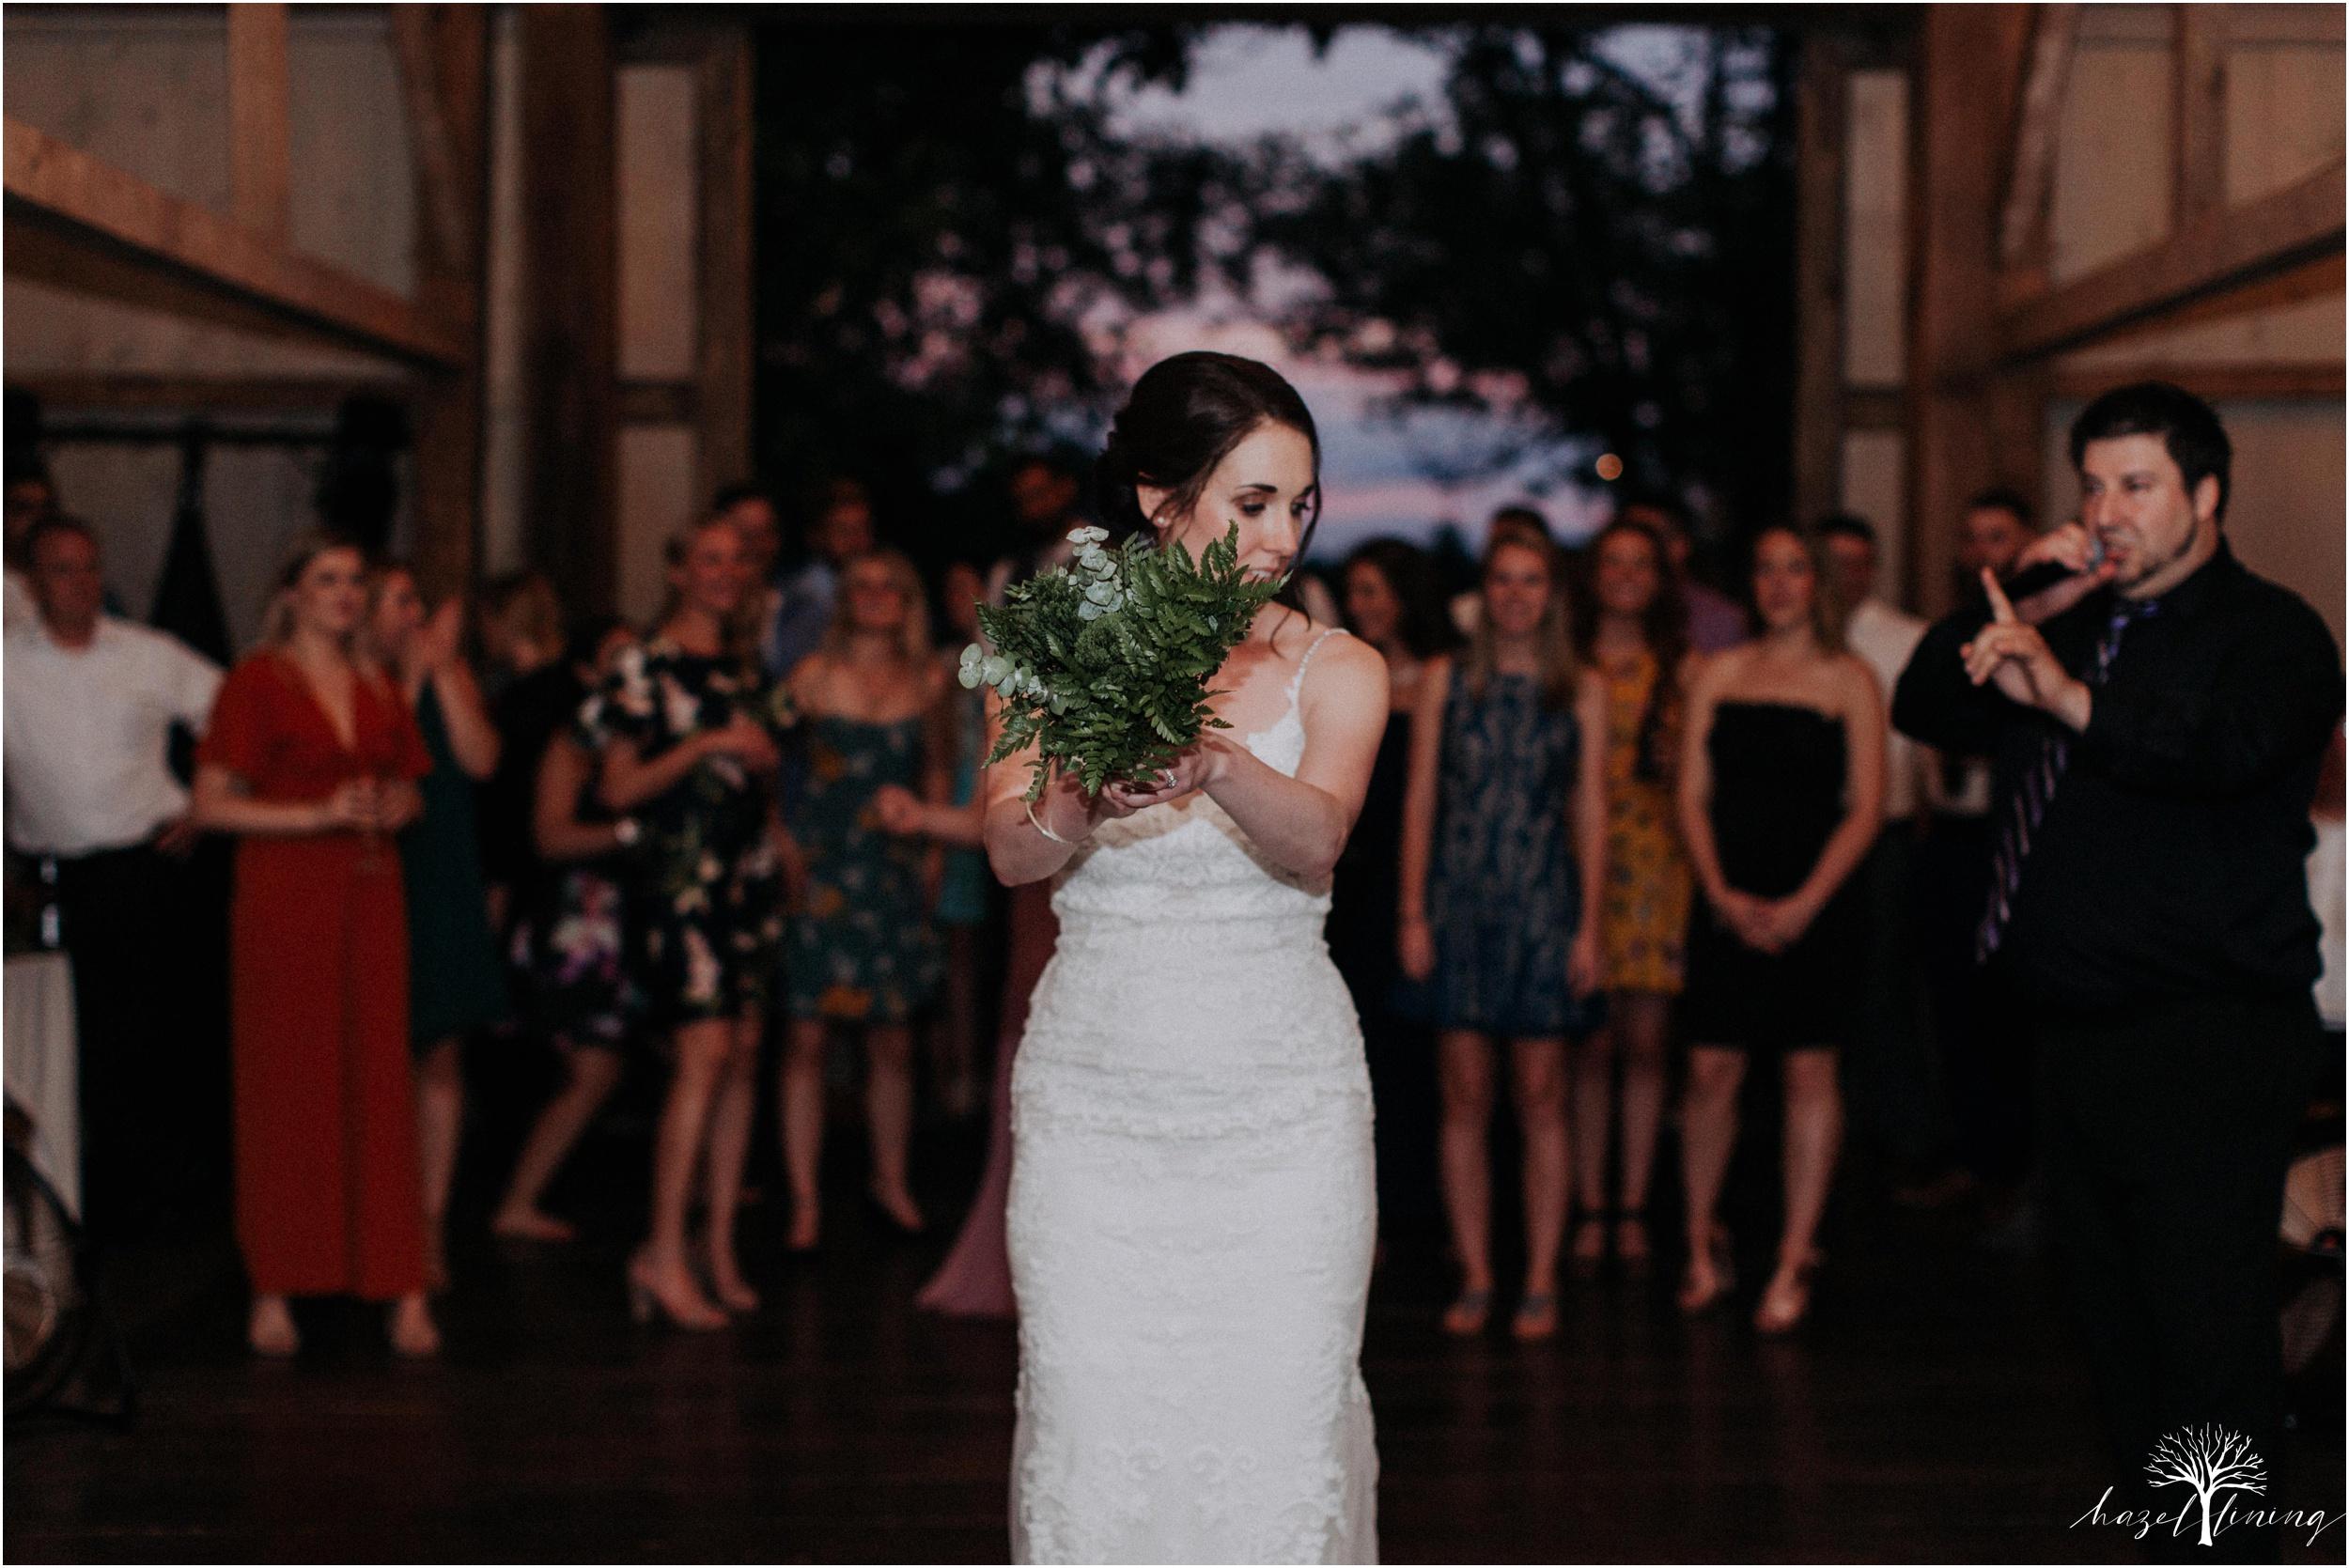 hazel-lining-travel-wedding-elopement-photography-lisa-landon-shoemaker-the-farm-bakery-and-events-bucks-county-quakertown-pennsylvania-summer-country-outdoor-farm-wedding_0163.jpg